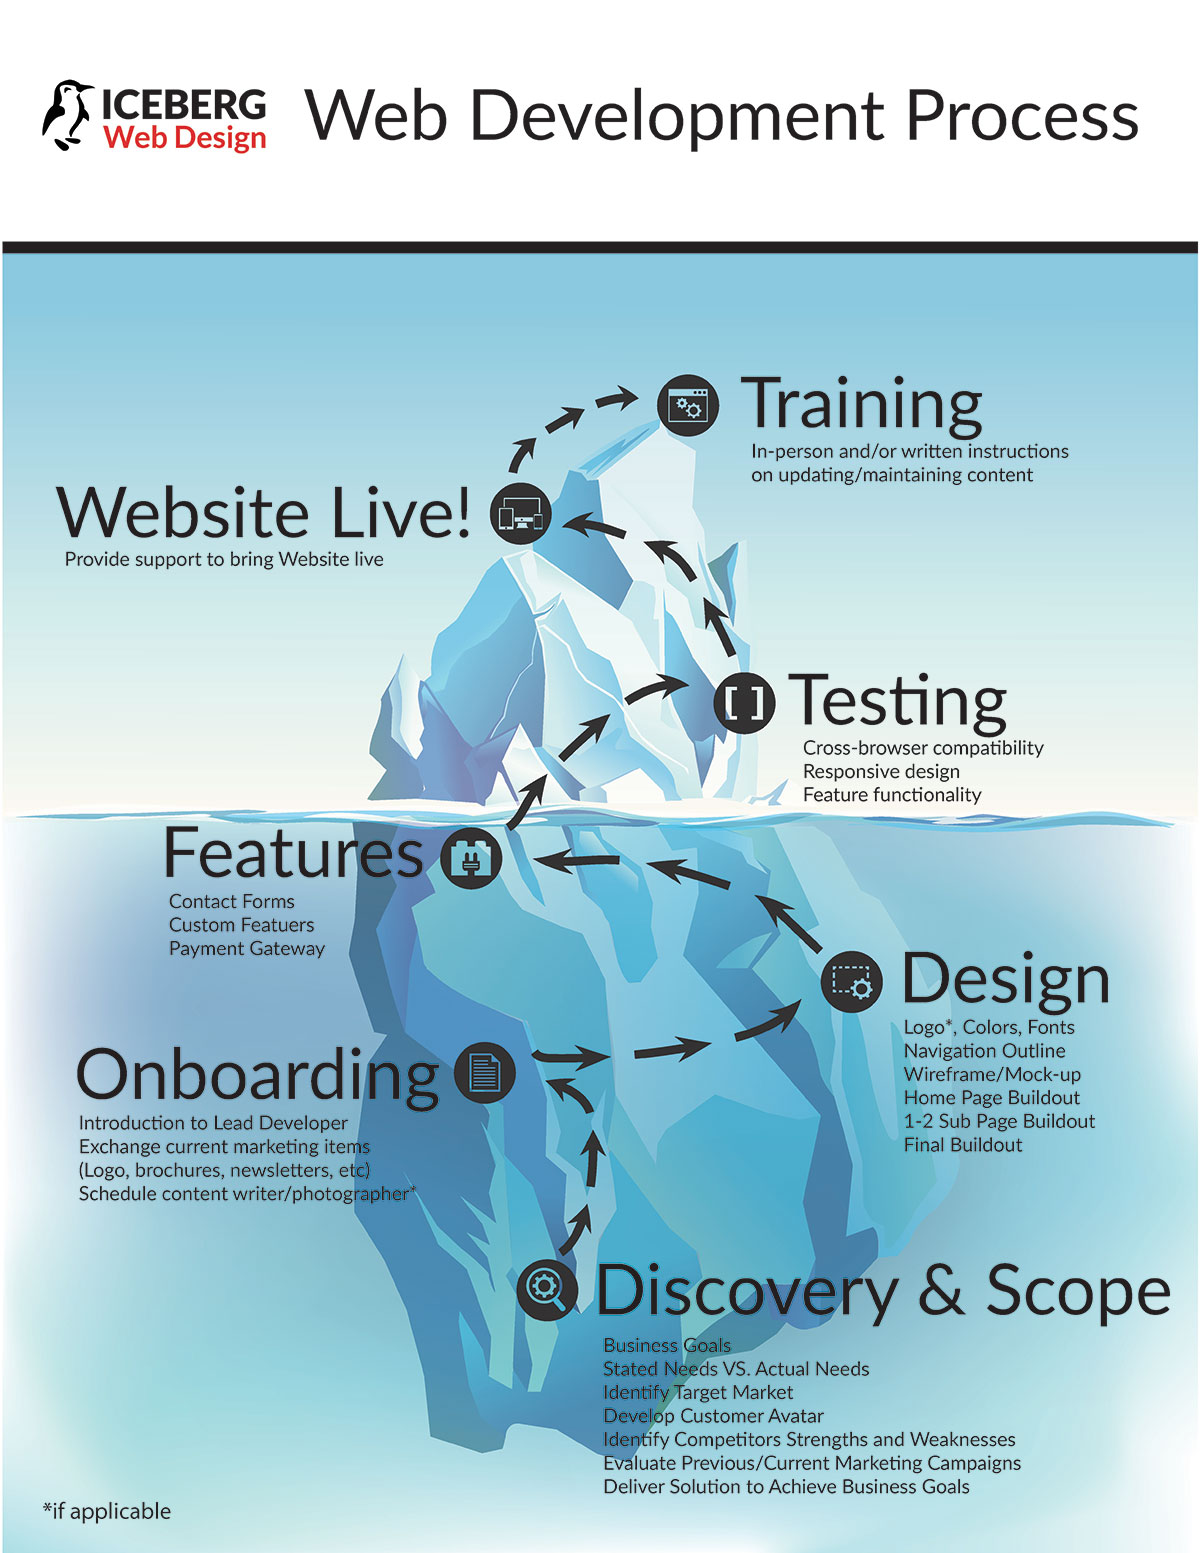 Website Development Process Iceberg Web Design